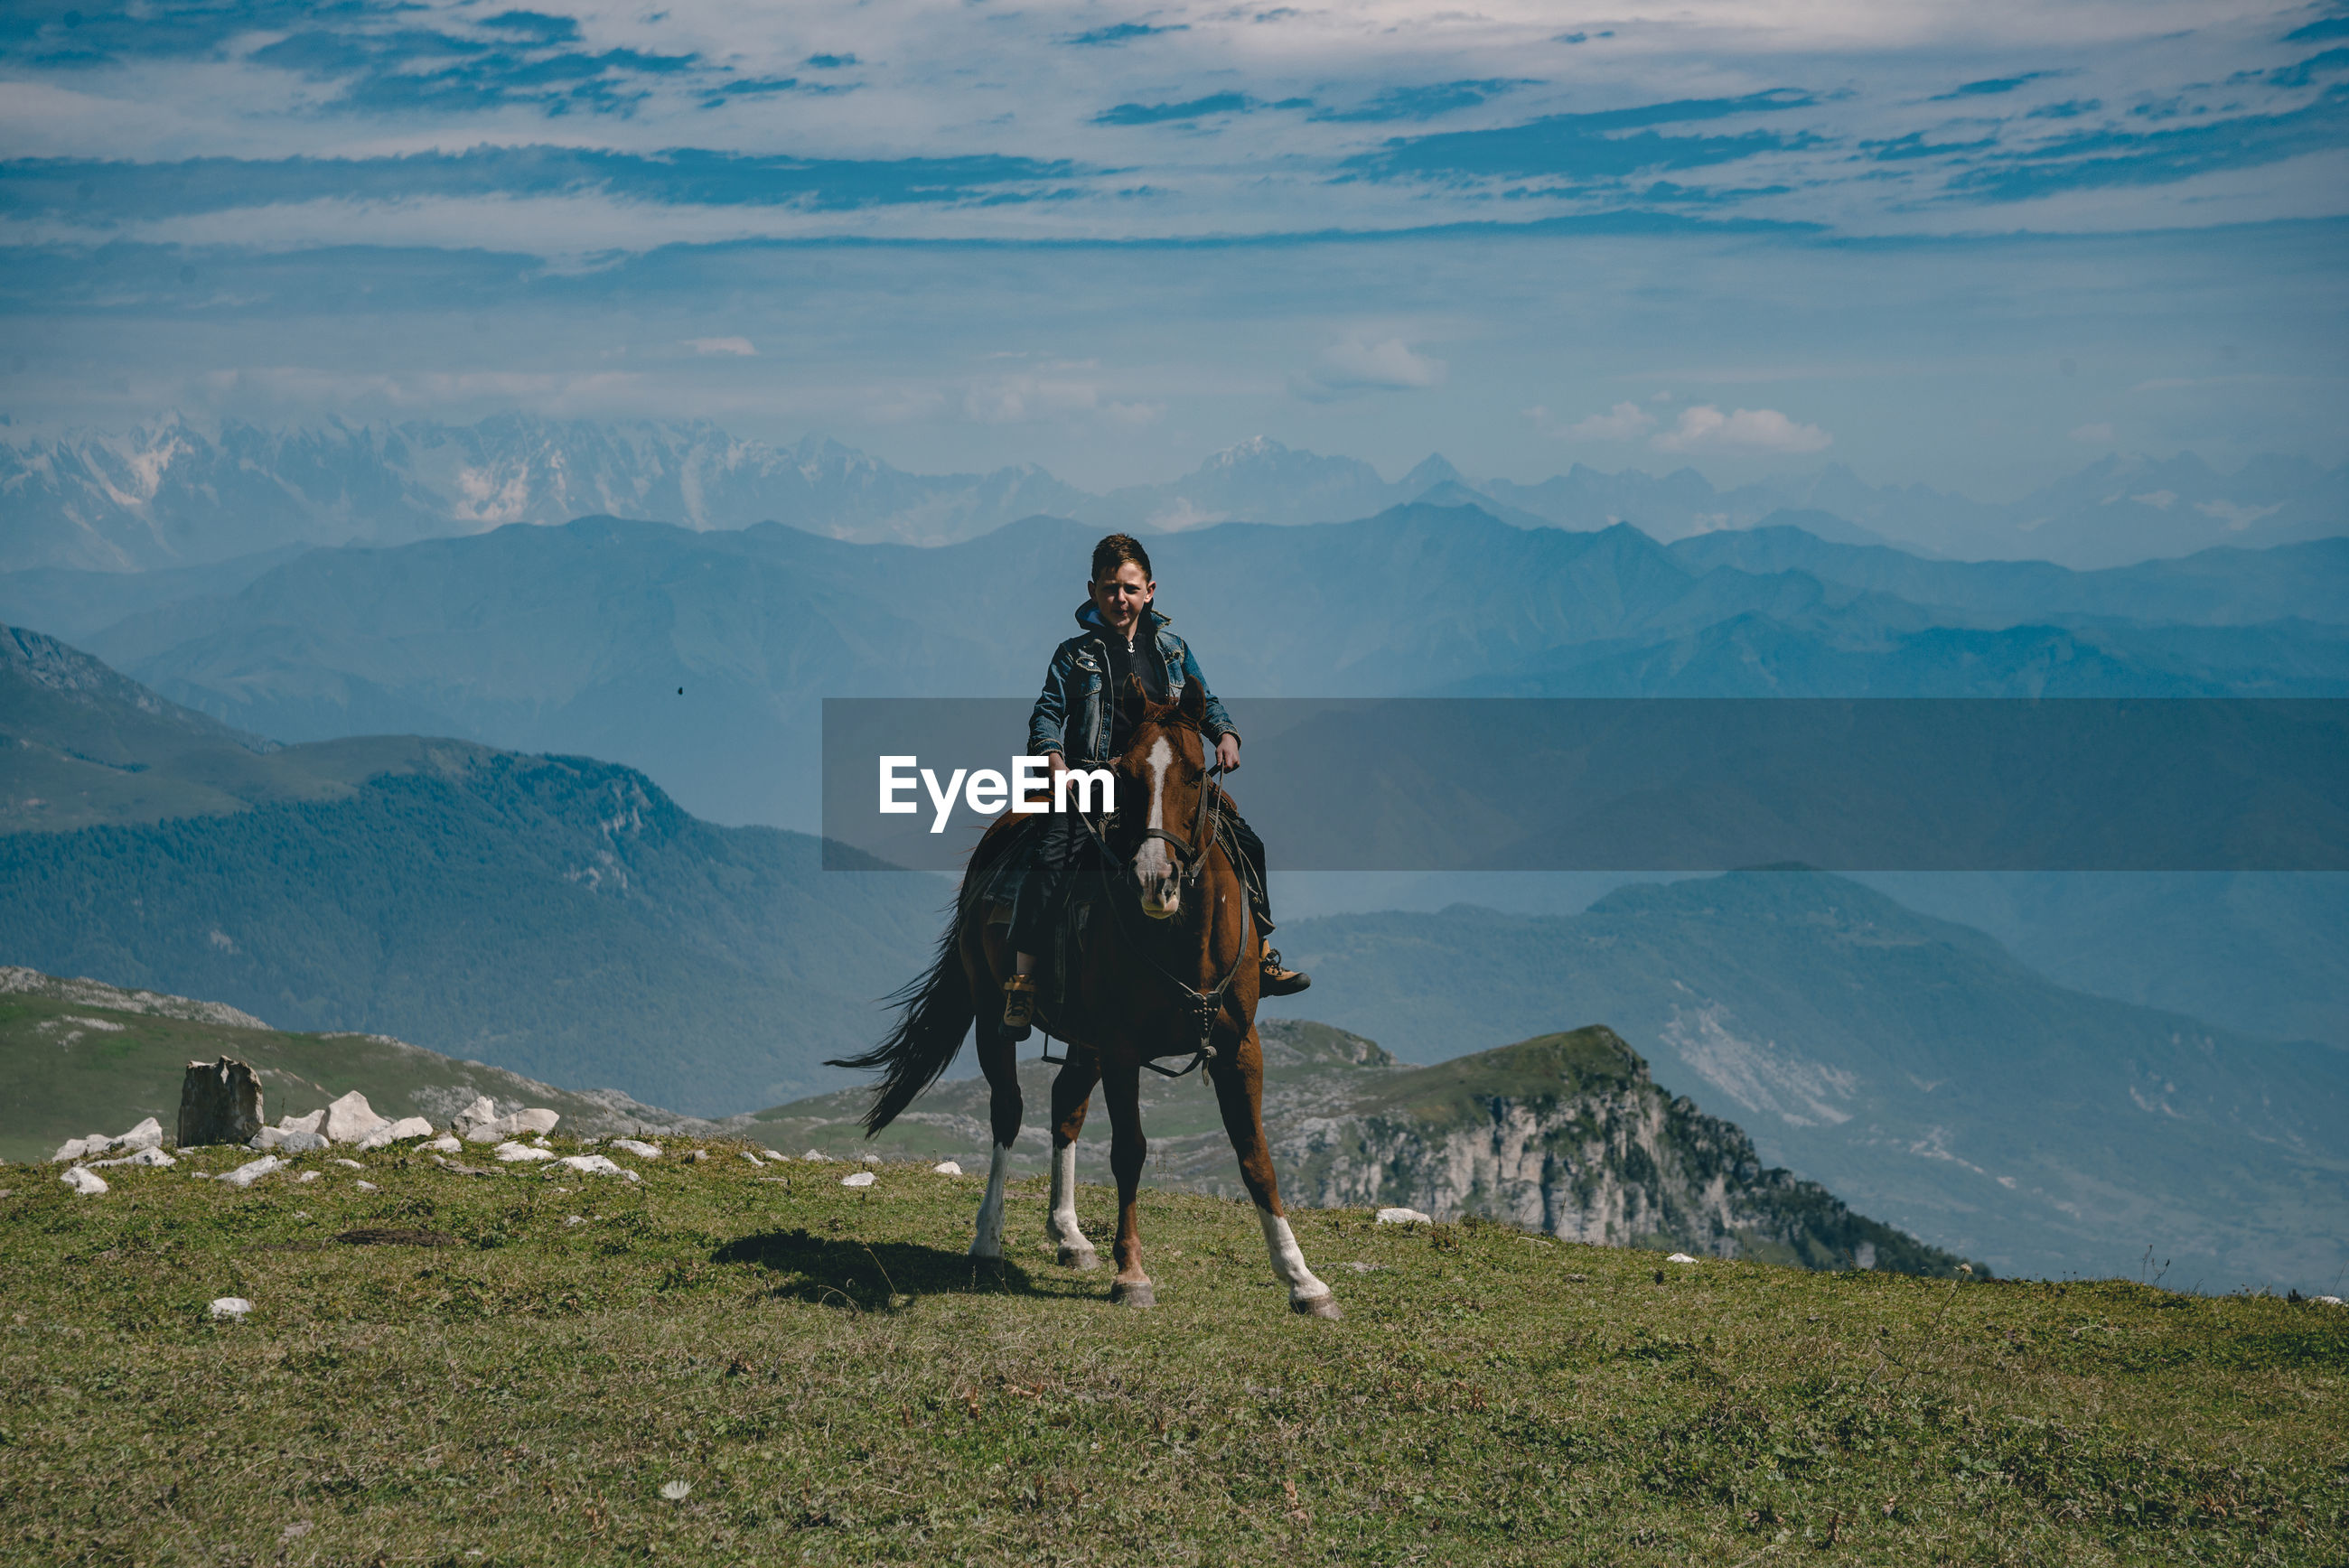 Full length of boy sitting on horse against mountain